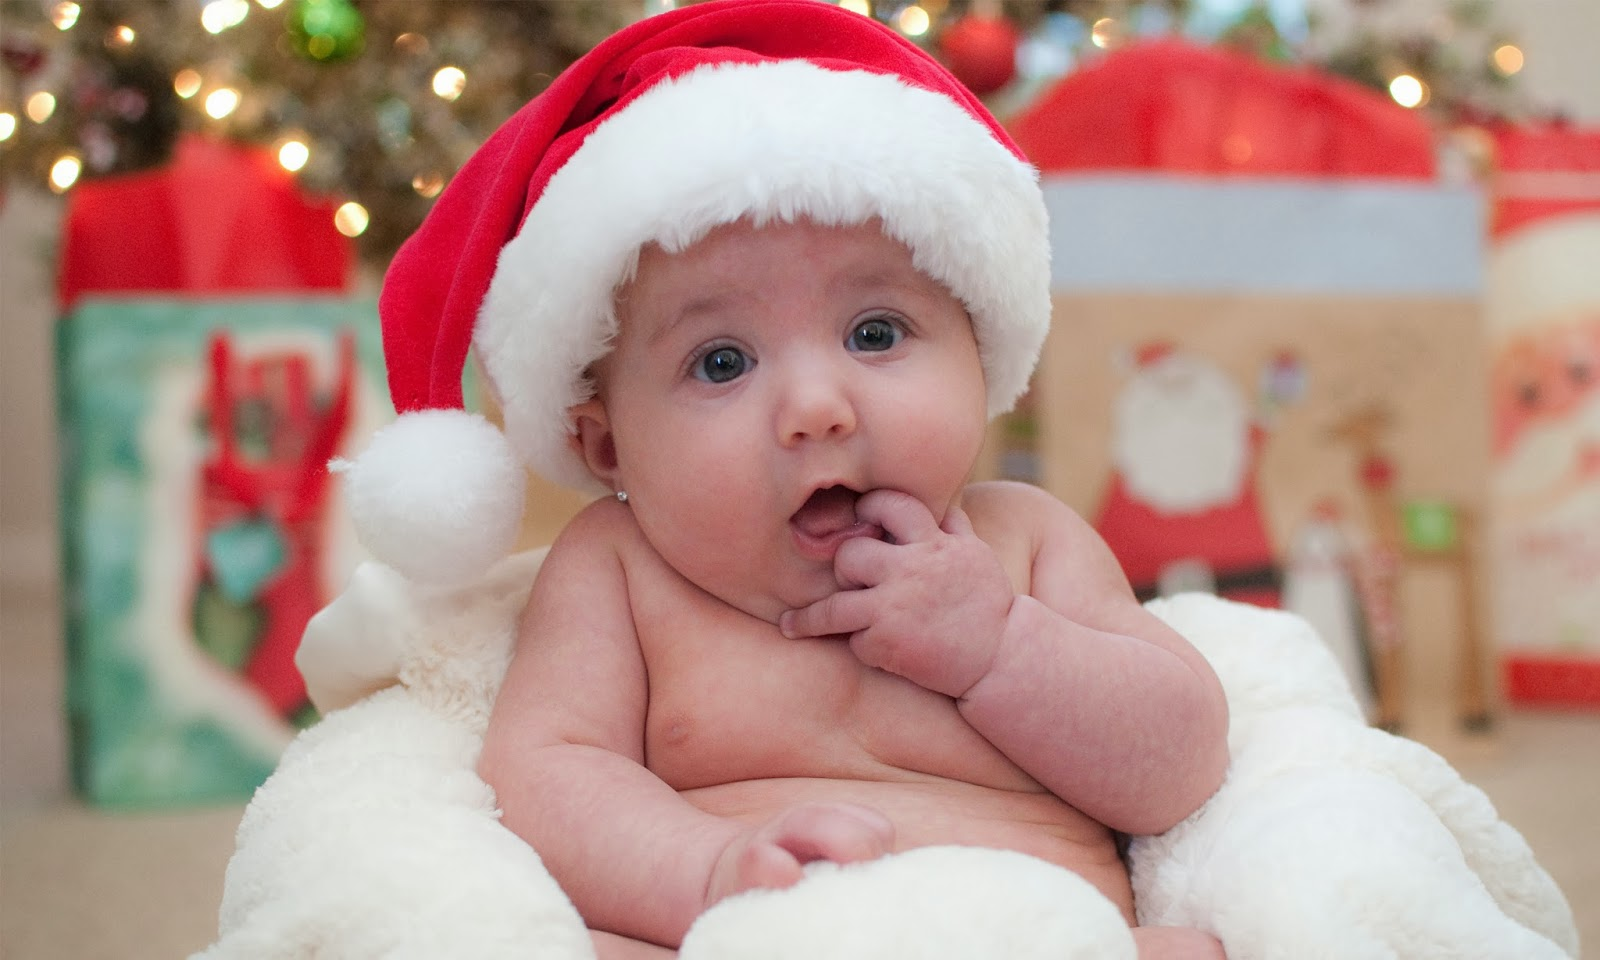 Christmas Baby Images Hd.Christmas Babies Hd Wallpapers